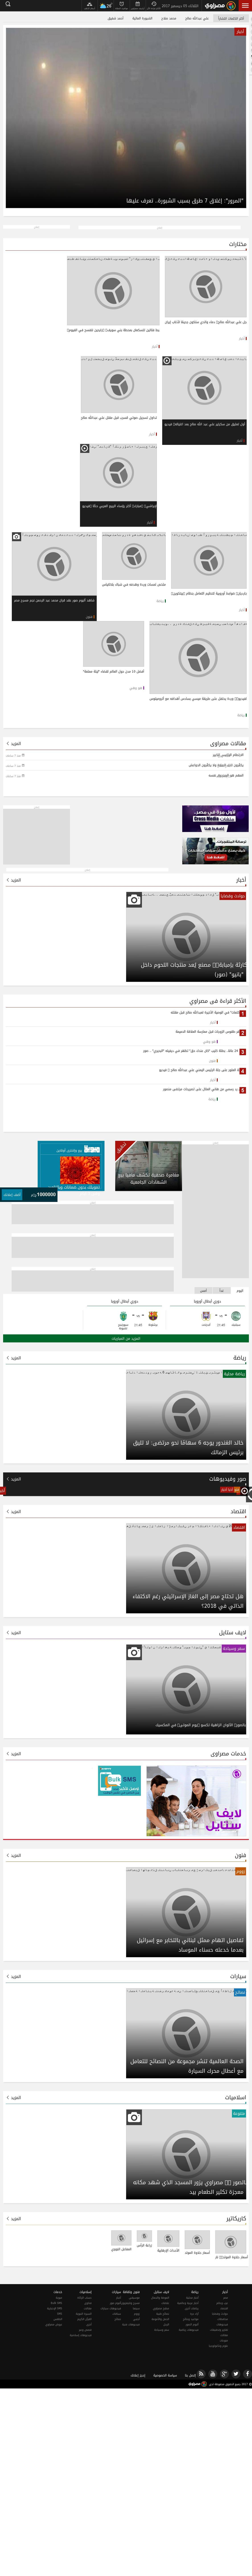 Masrawy at Tuesday Dec. 5, 2017, 12:11 a.m. UTC